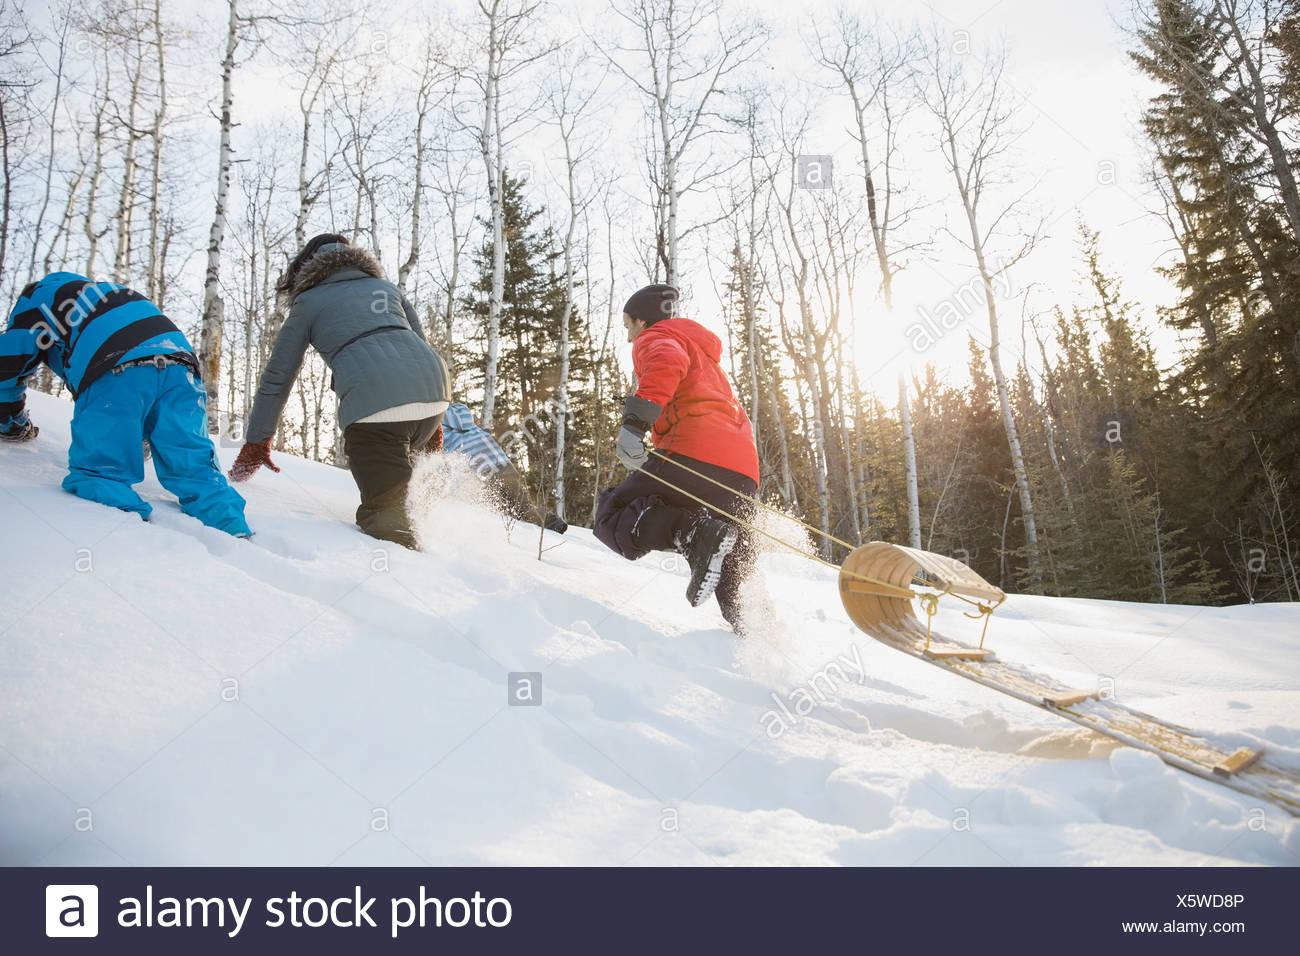 Familia caminar cuesta arriba tirando de tobogán Imagen De Stock